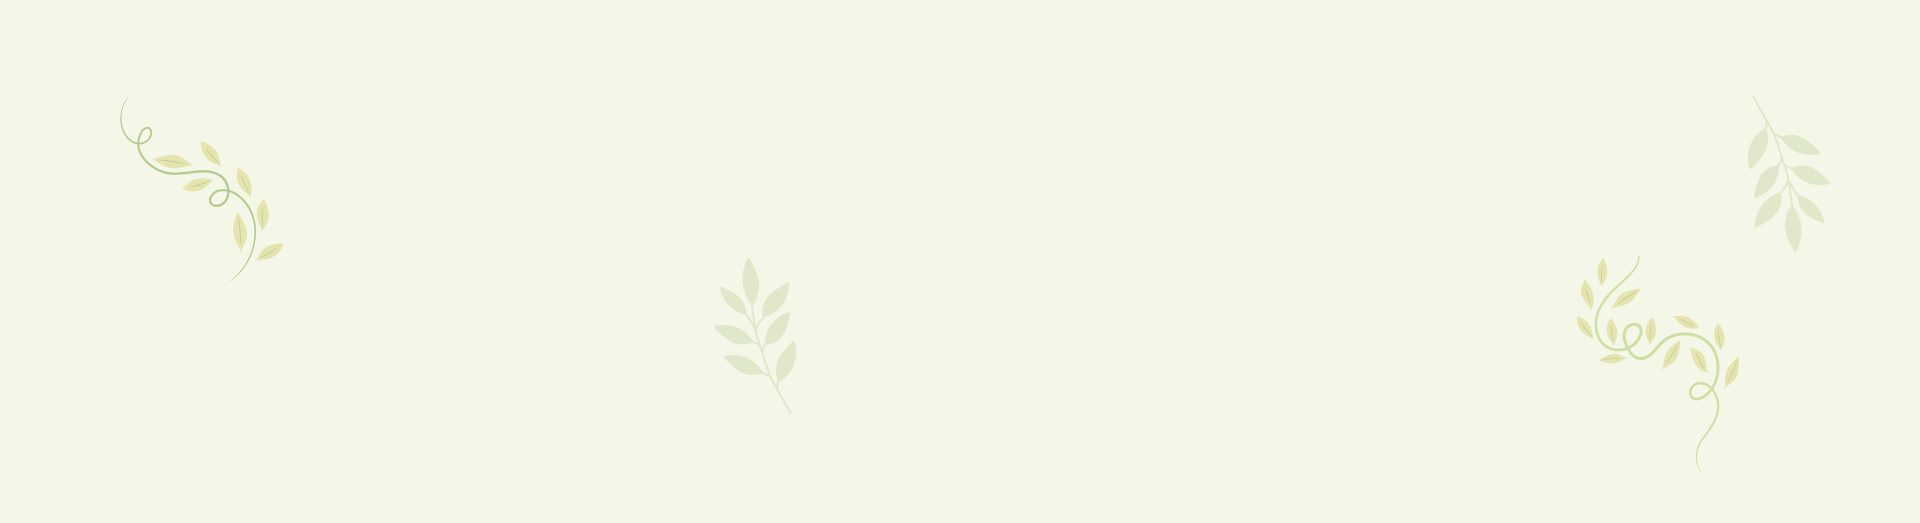 bg-crop-home-1-4